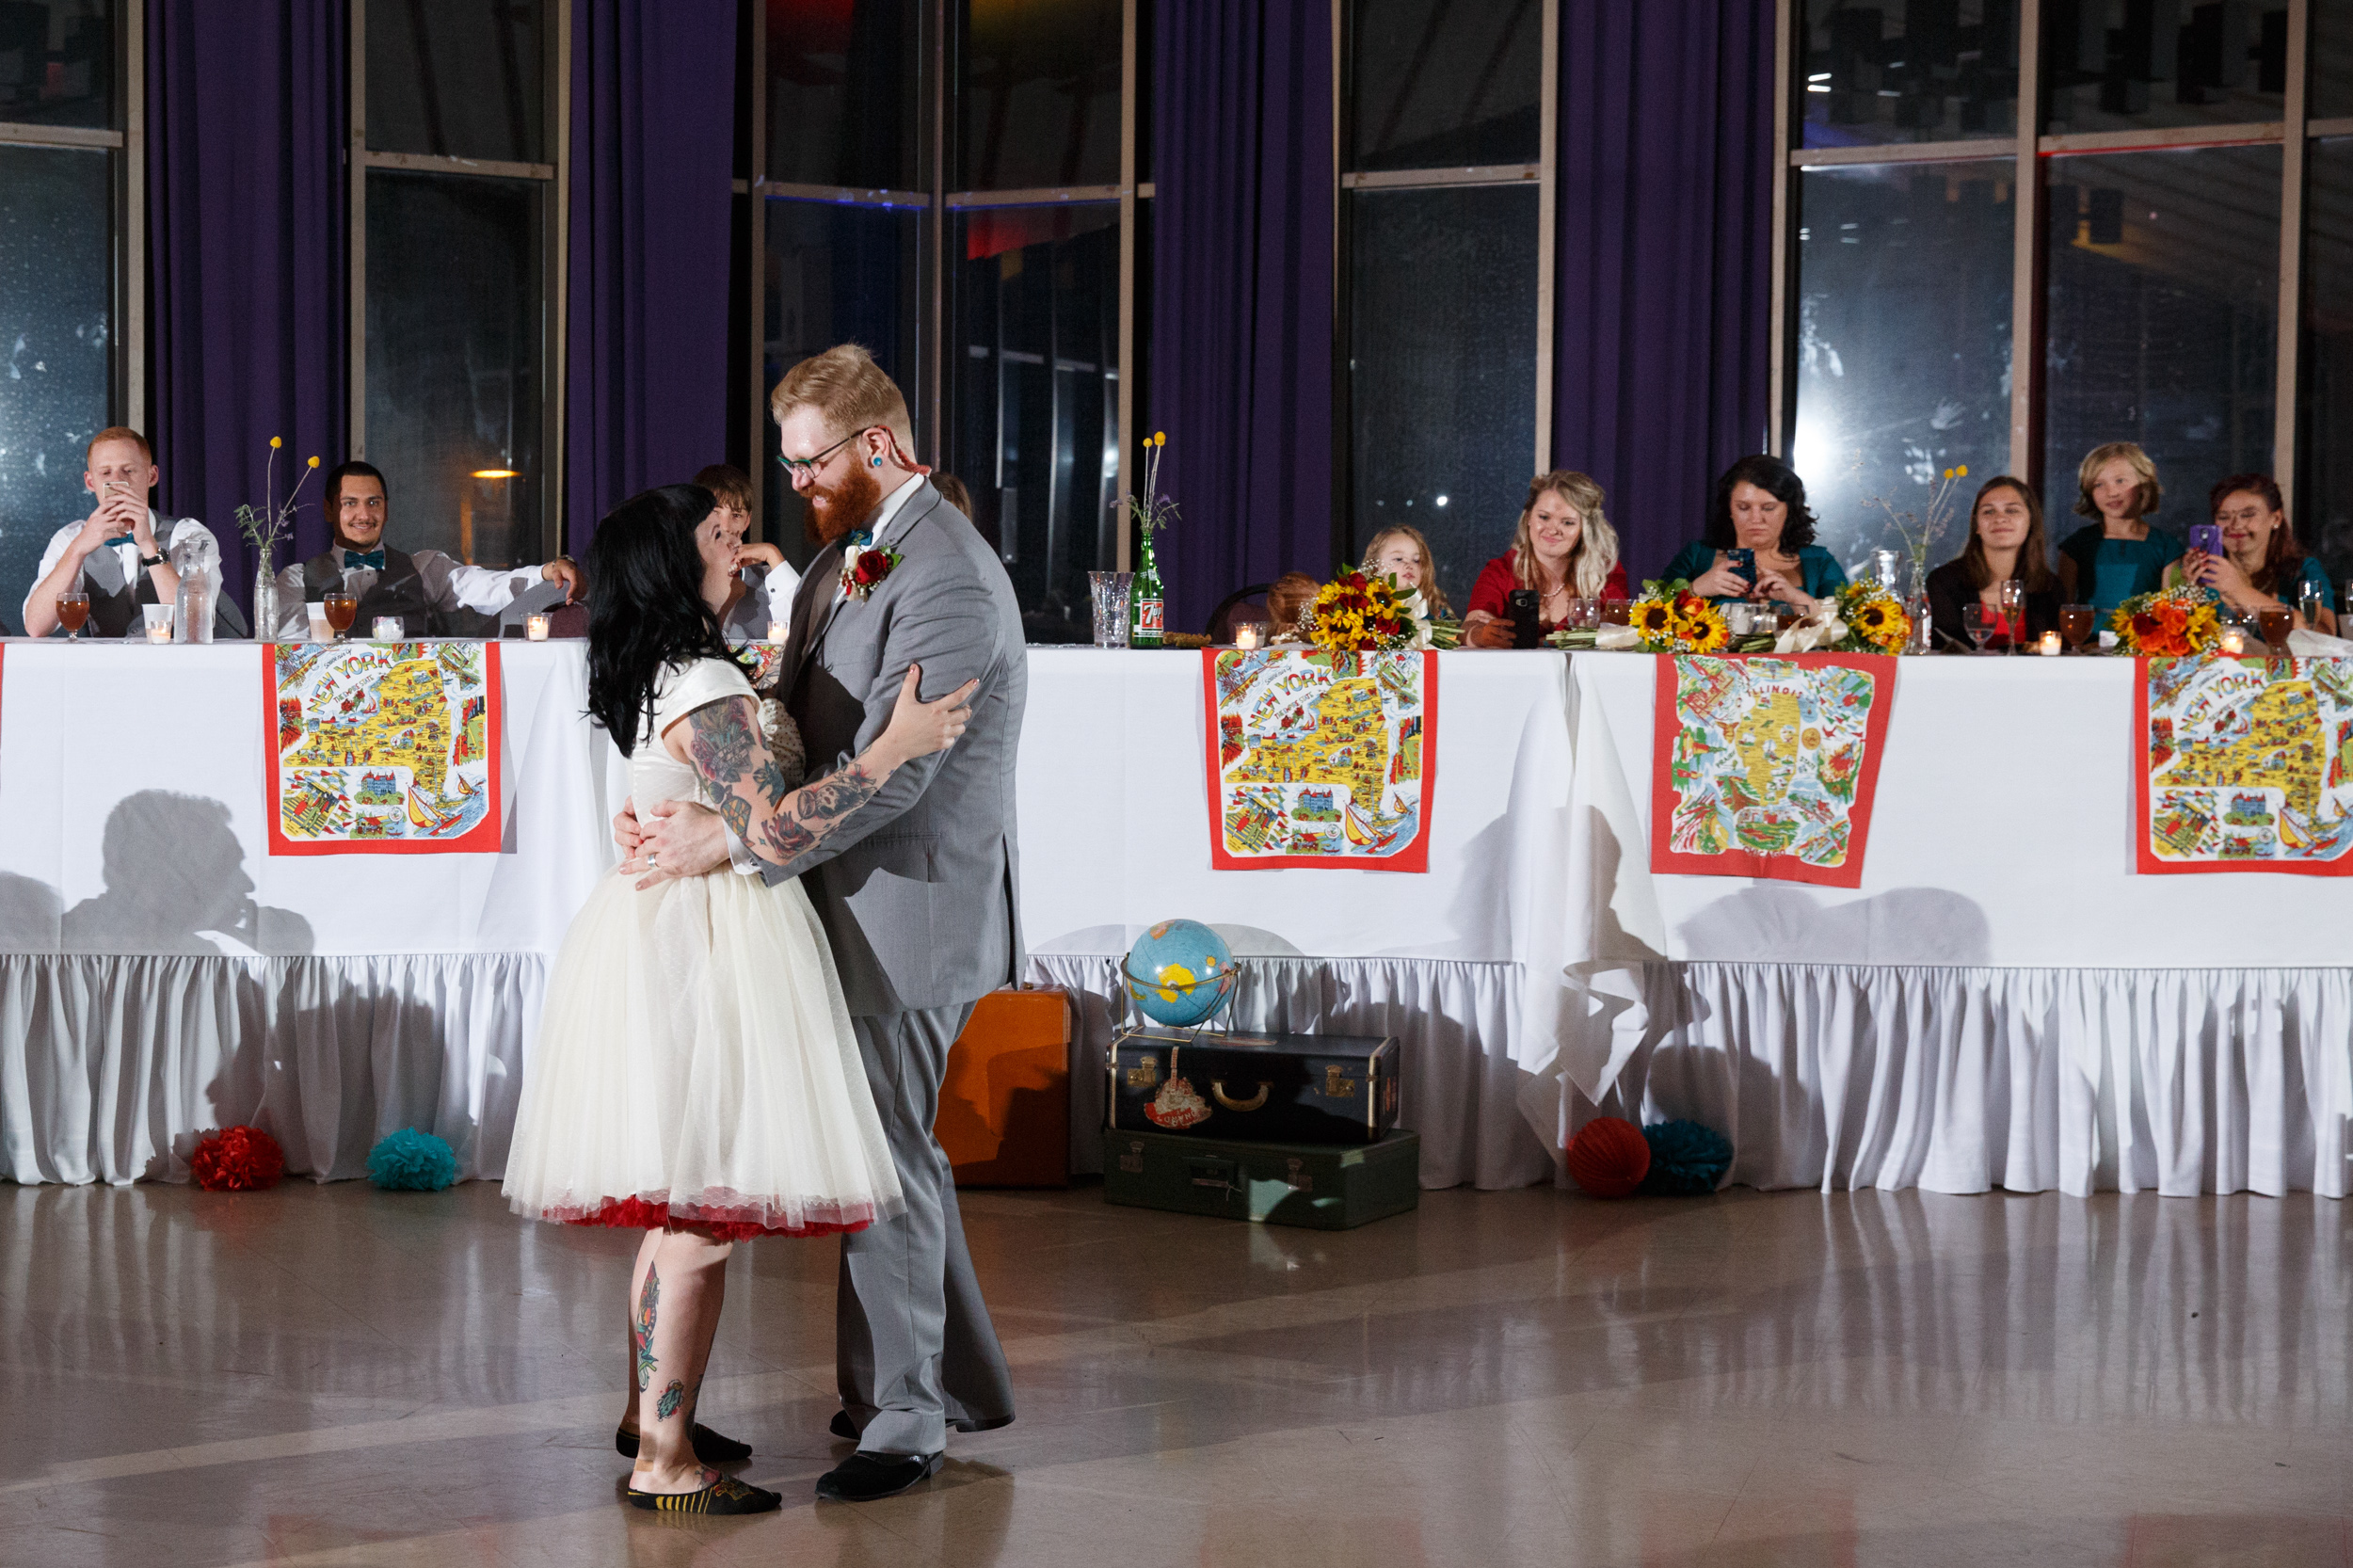 Christian & Sarah wedding photography by Brian milo-251.jpg